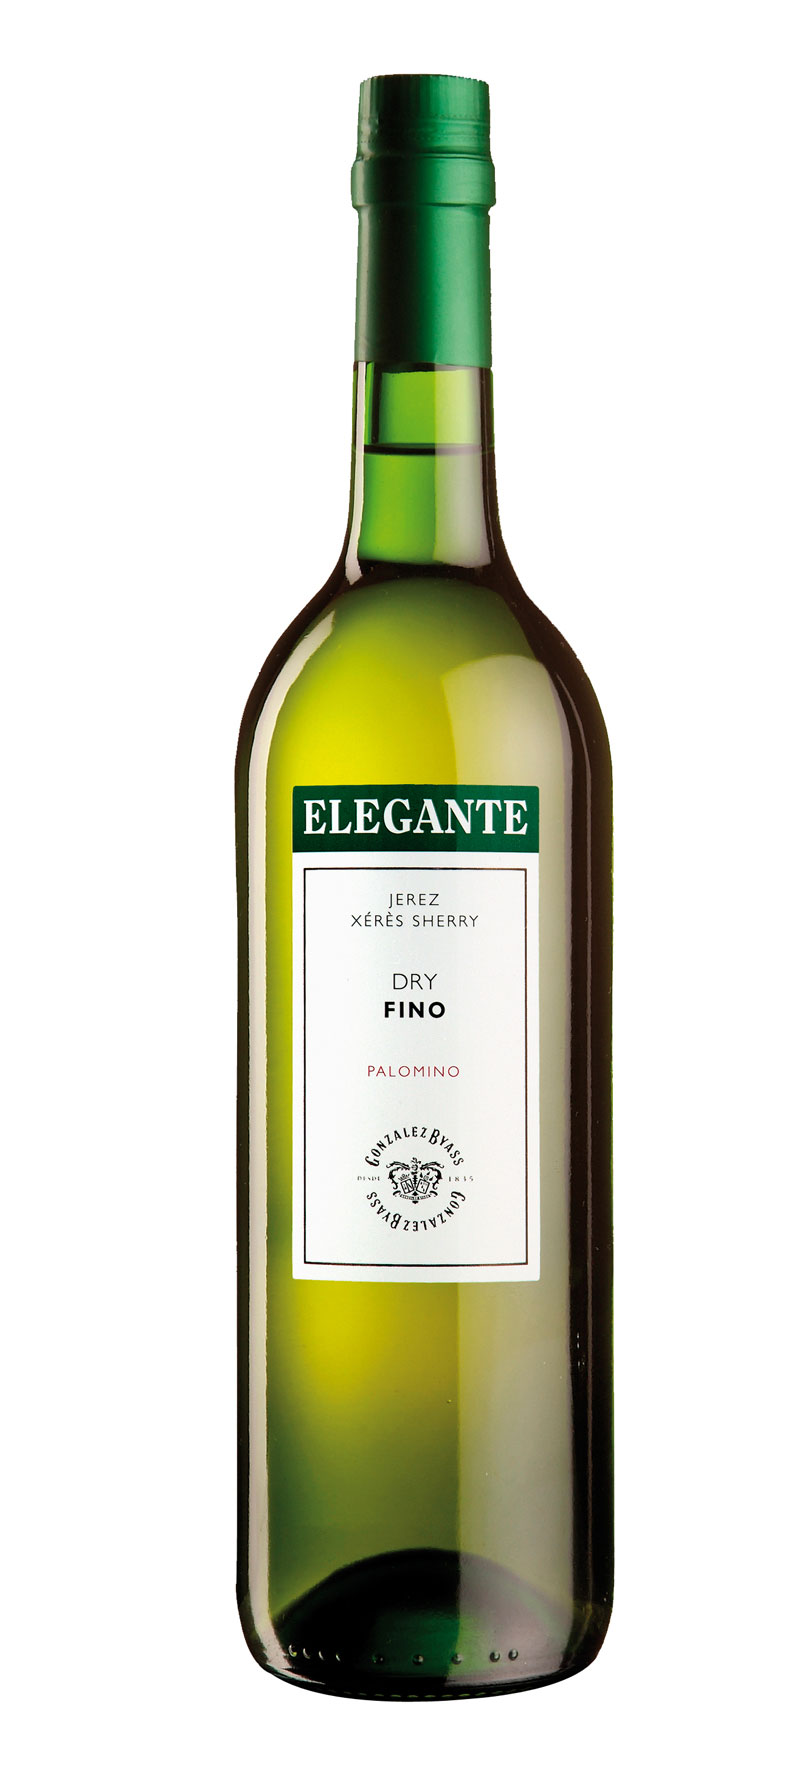 Elegante Dry Fino Gonzalez Byass